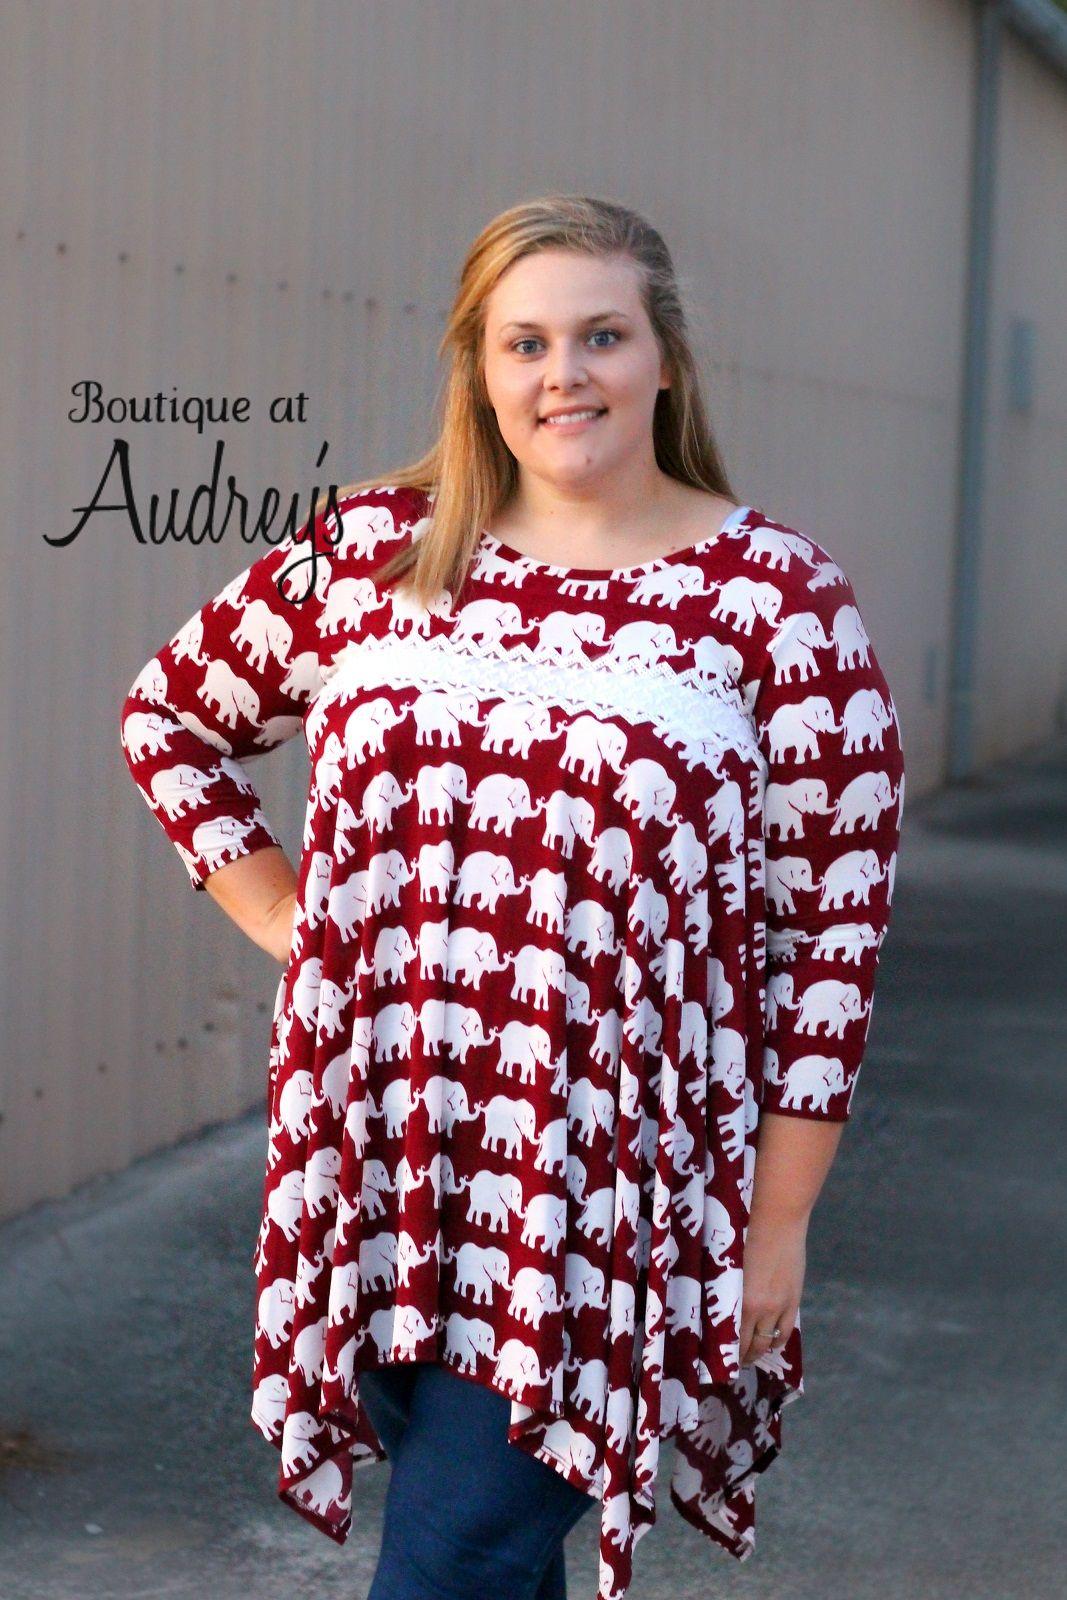 dc62bd1ee48 Crimson Elephant Print Gameday Asymmetrical Tunic Dress with Sheer Lace  Detail  alabama  bama  rolltide  rtr  gameday